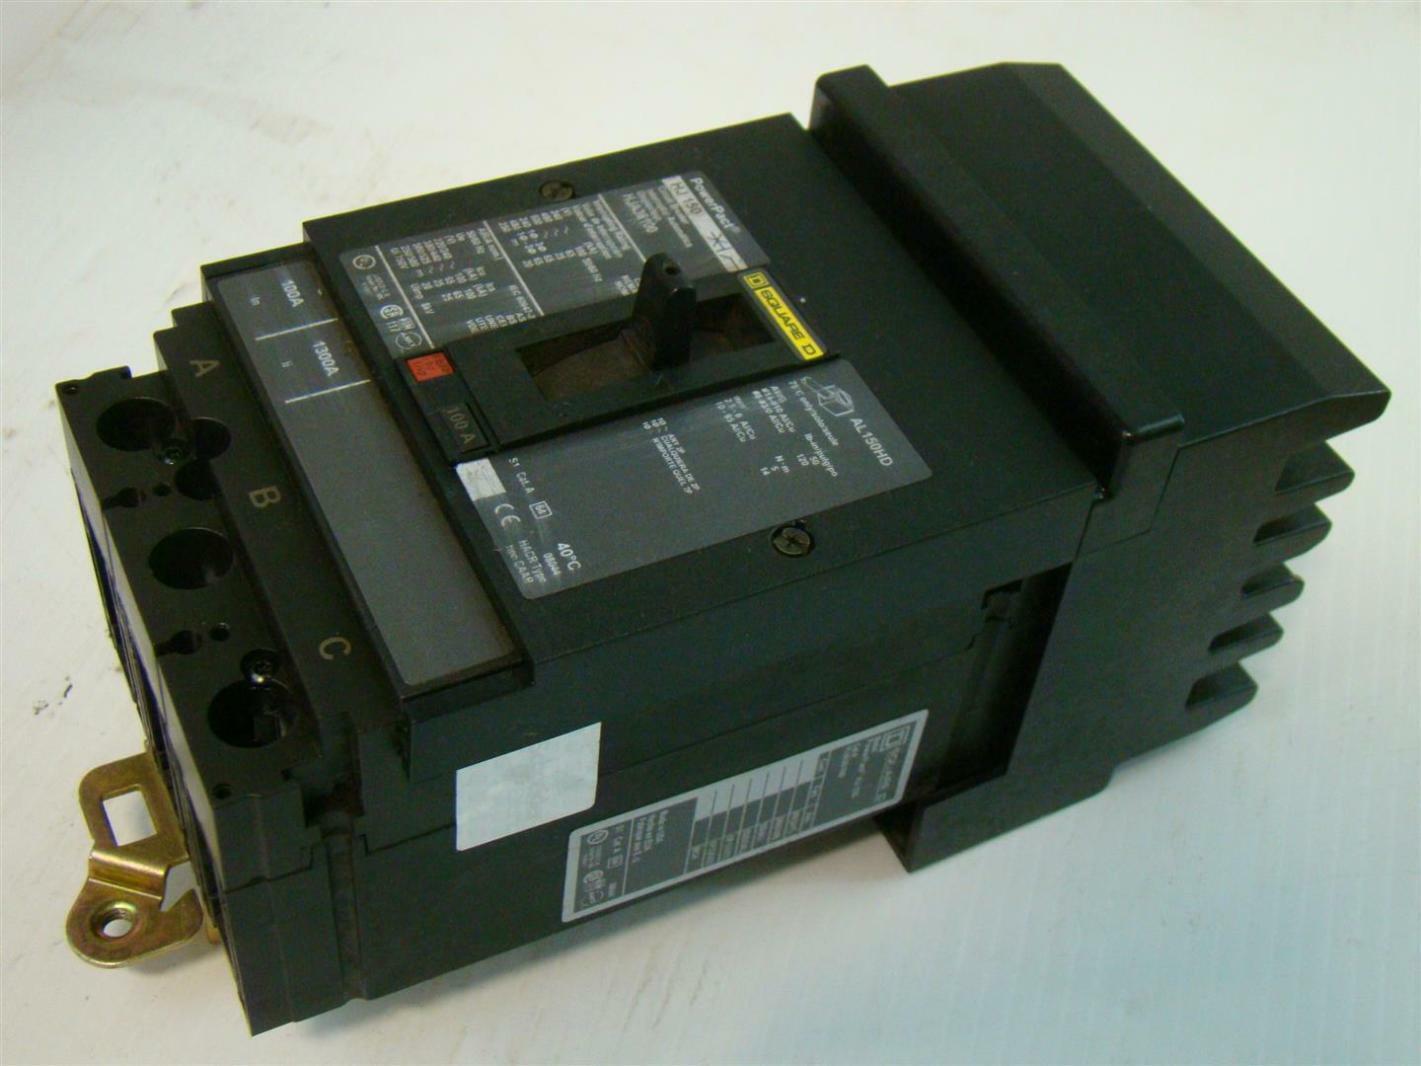 Square D I Line Circuit Breakers Data Wiring Diagrams Homeline Breaker Hj 150 100a Powerpact Hja36100 Rh Ebay Com Fa